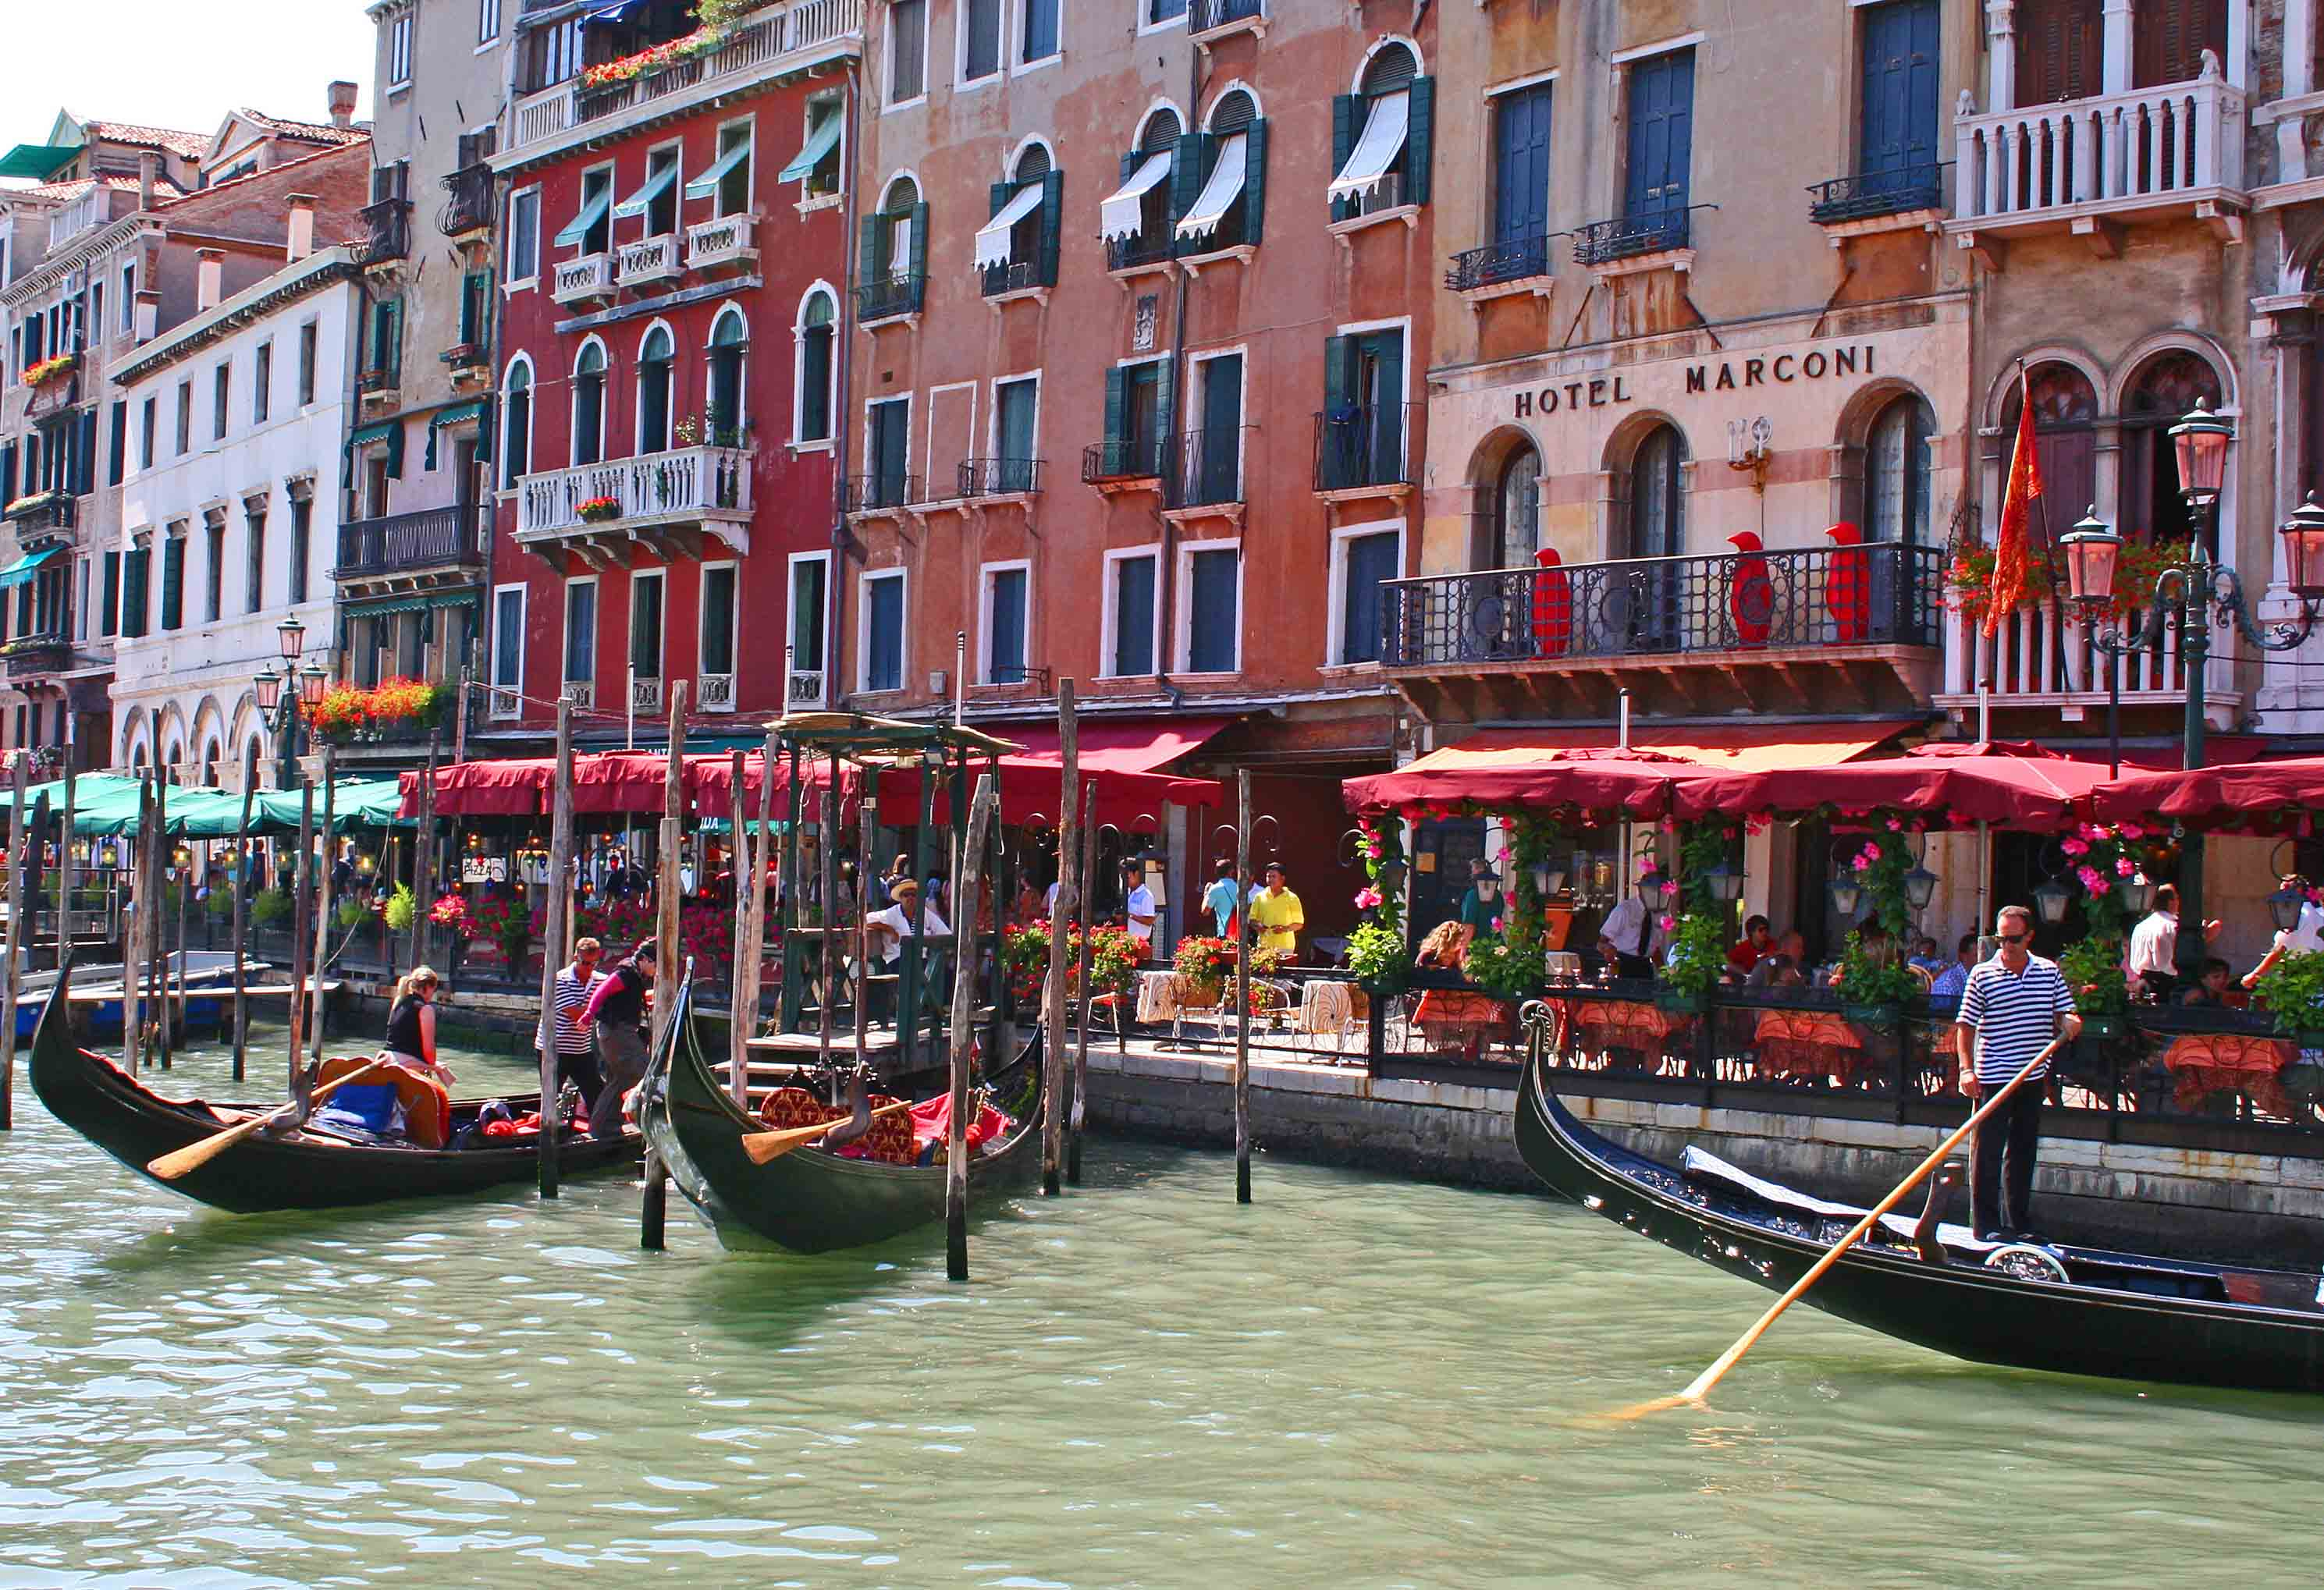 Grand Canal #1 - Venice, Italy